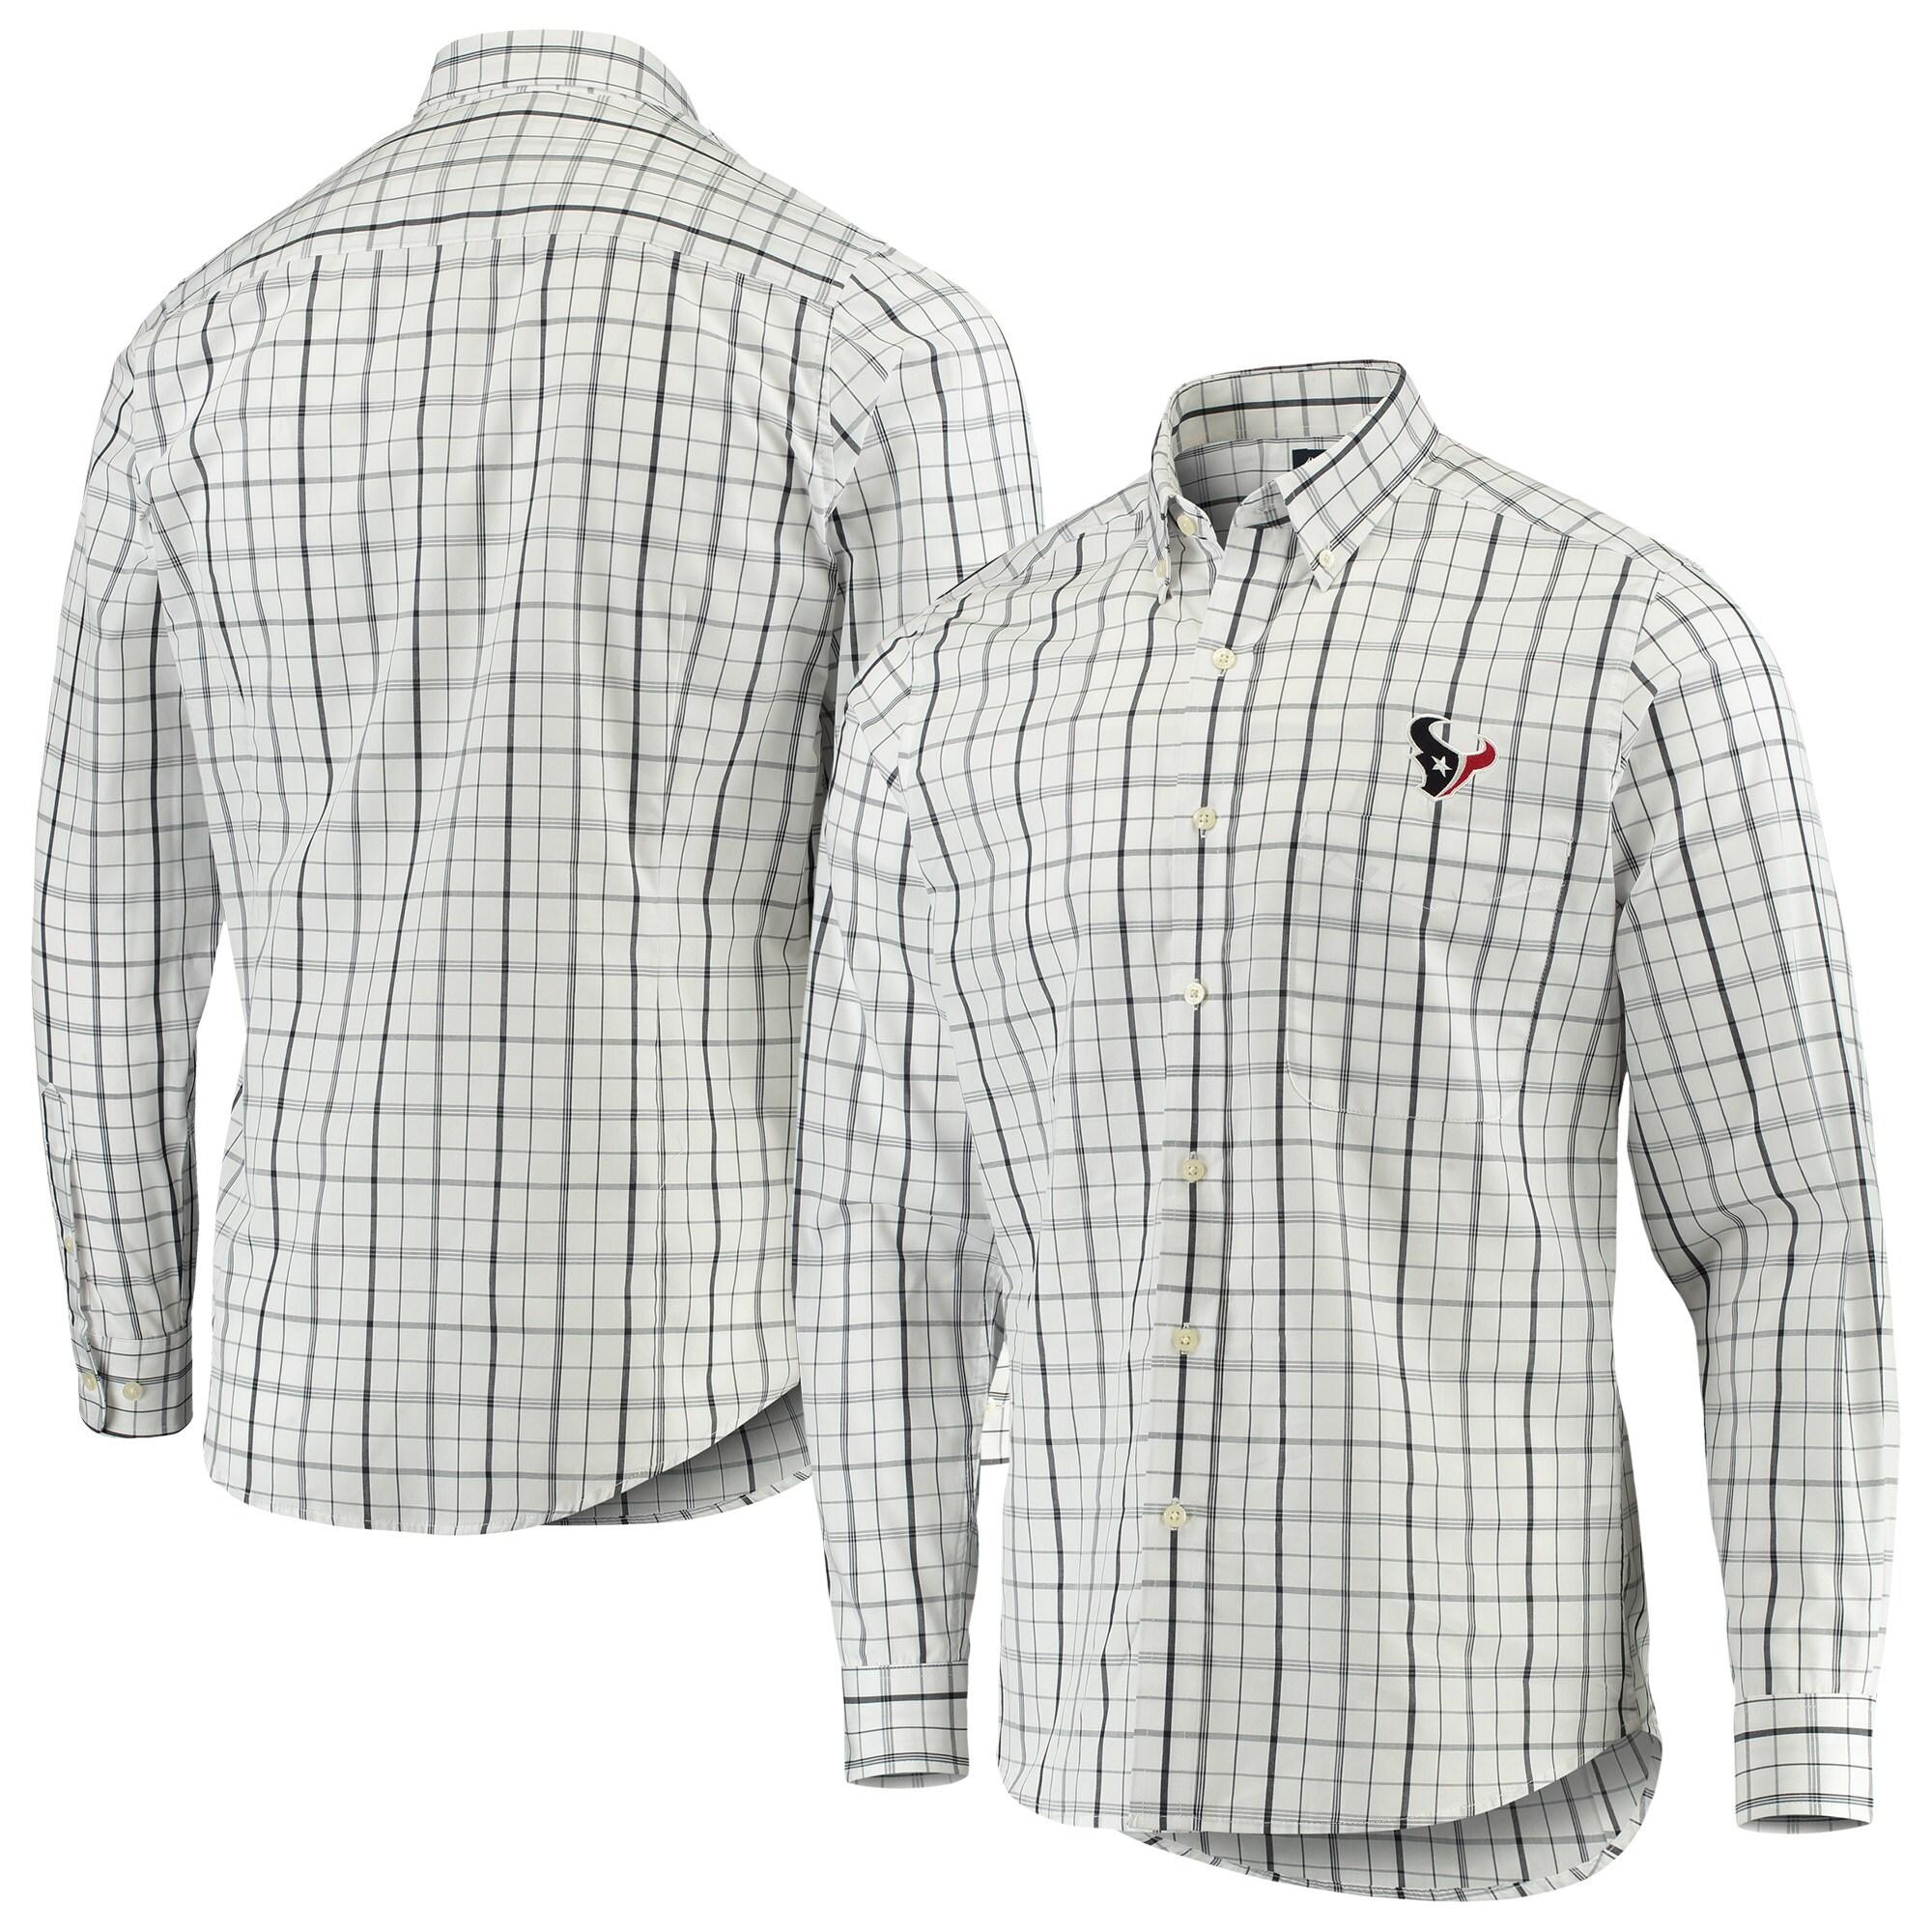 Houston Texans Antigua Keen Long Sleeve Button-Down Shirt - White/Navy